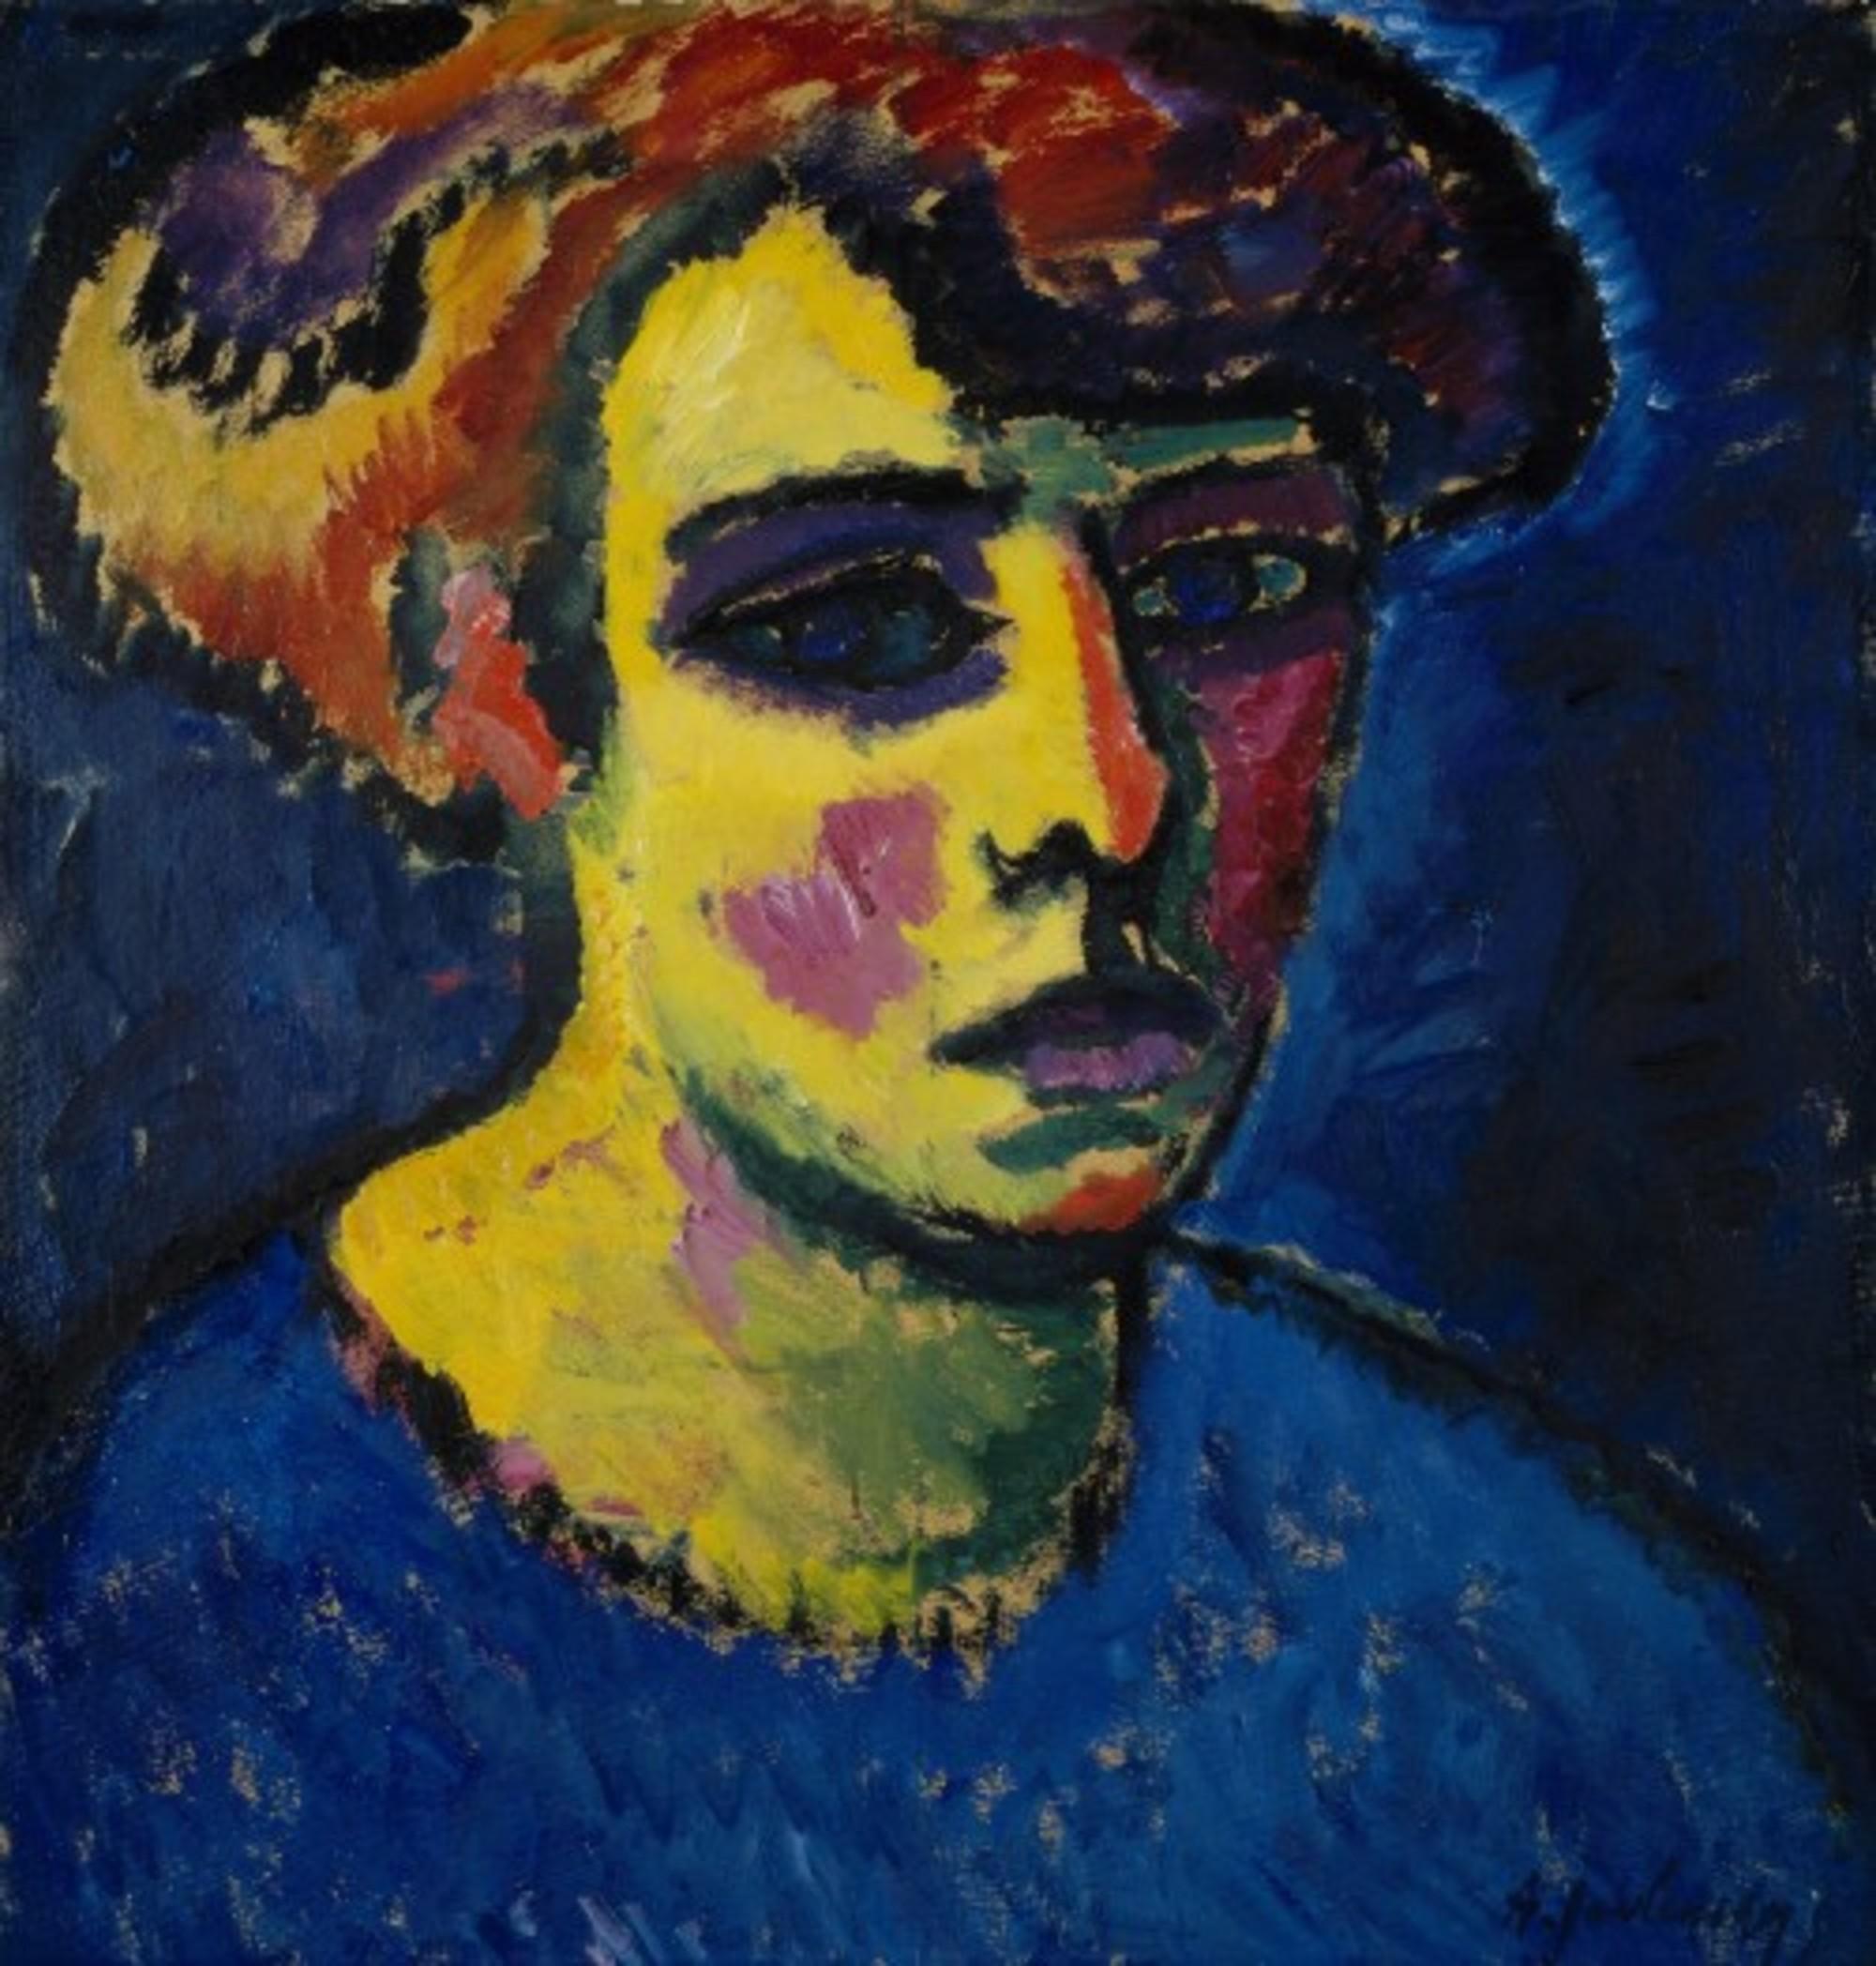 Alexej-von-Jawlensky---Frauenkopf-Head-of-a-Woman---Google-Art-Project.jpg